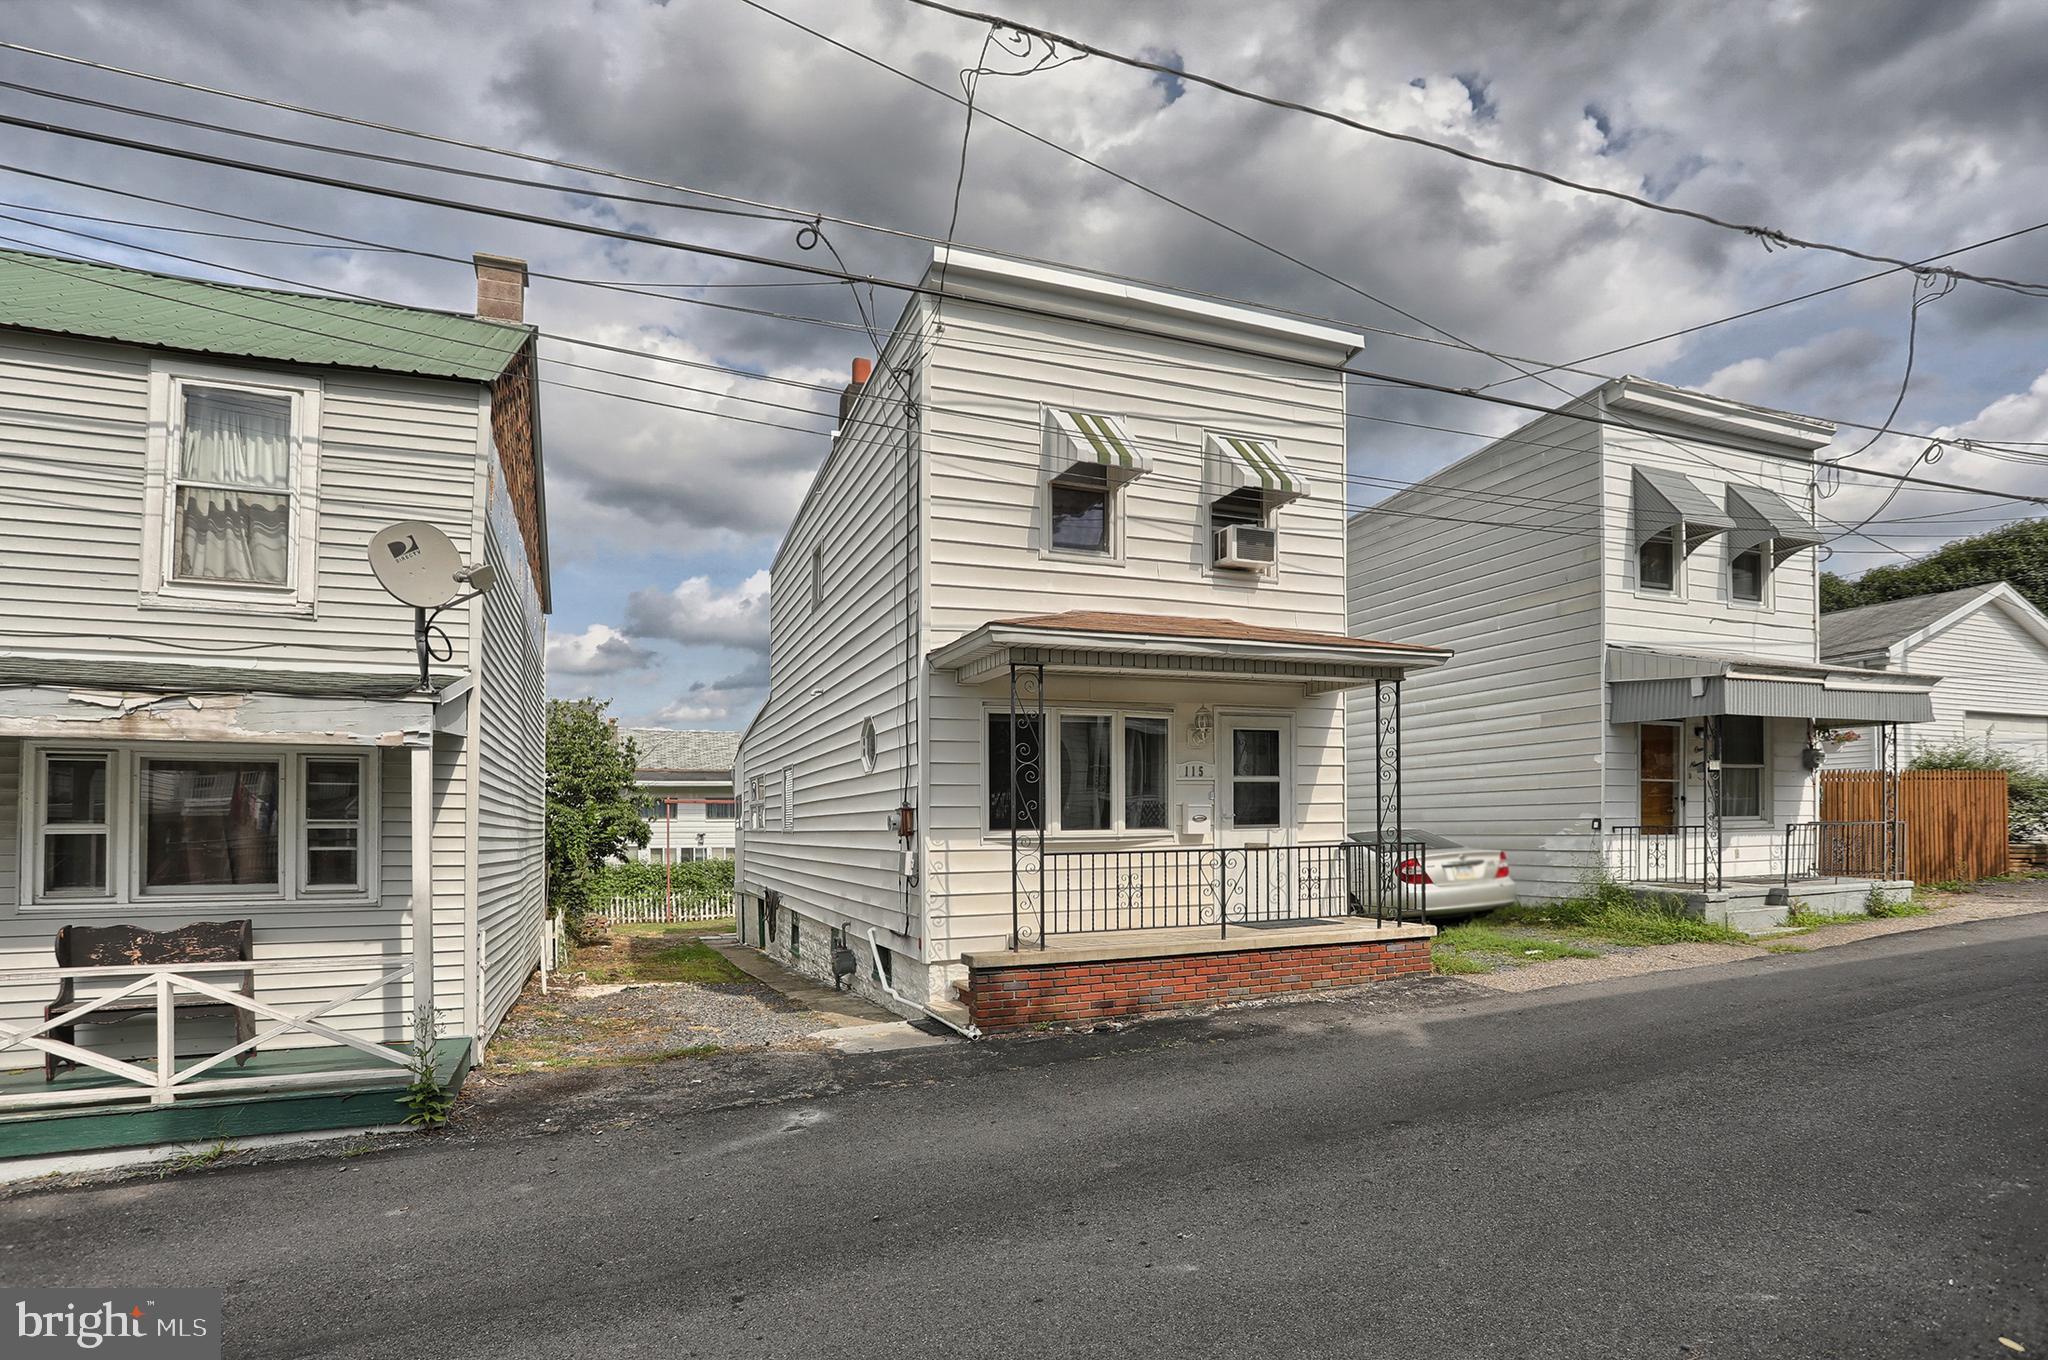 115 S PLUM STREET, MOUNT CARMEL, PA 17851